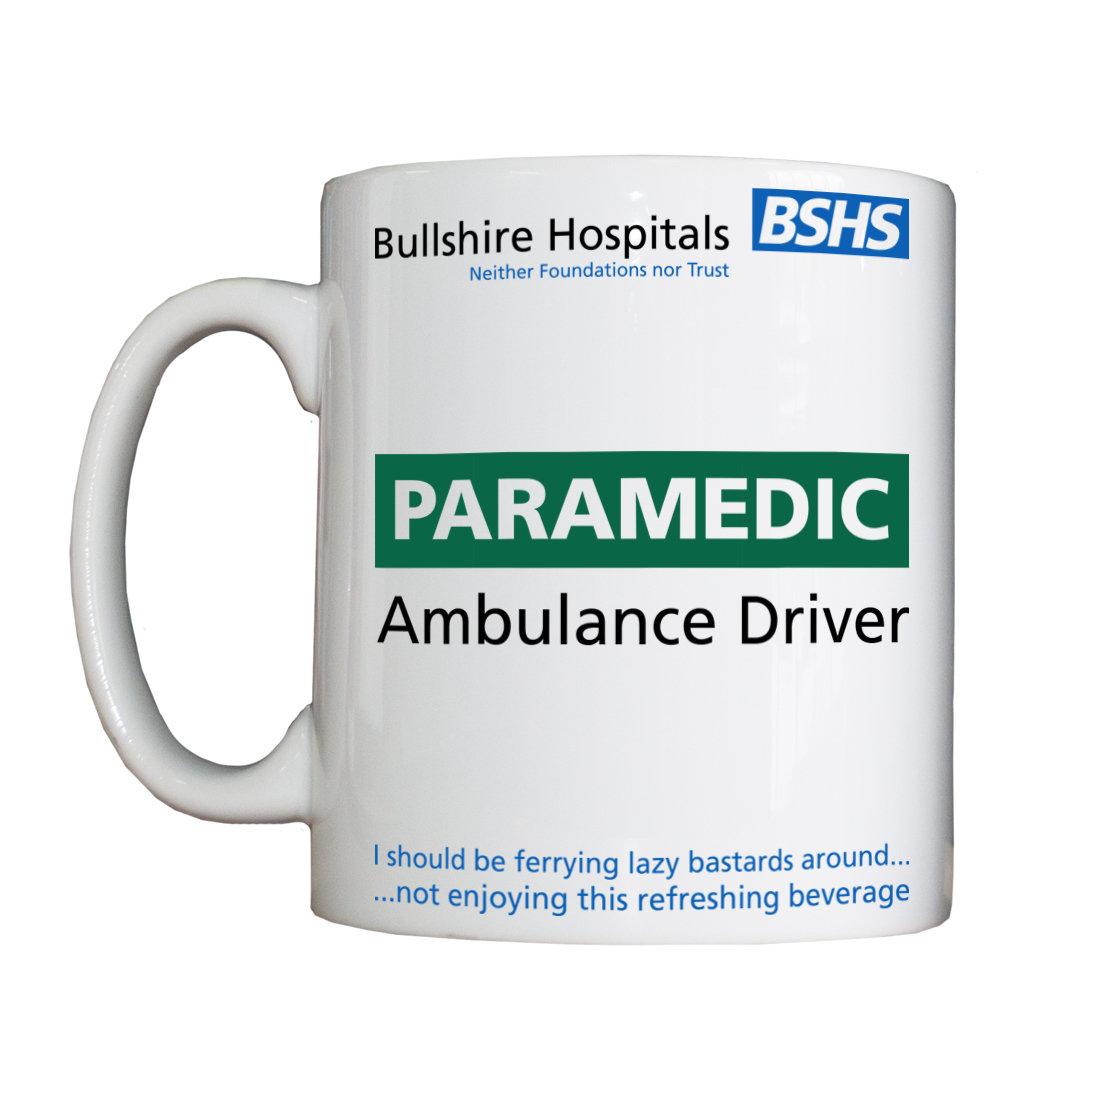 Personalised 'BSHS Paramedic' Drinking Vessel BSHSParamedicVesselAmbulance